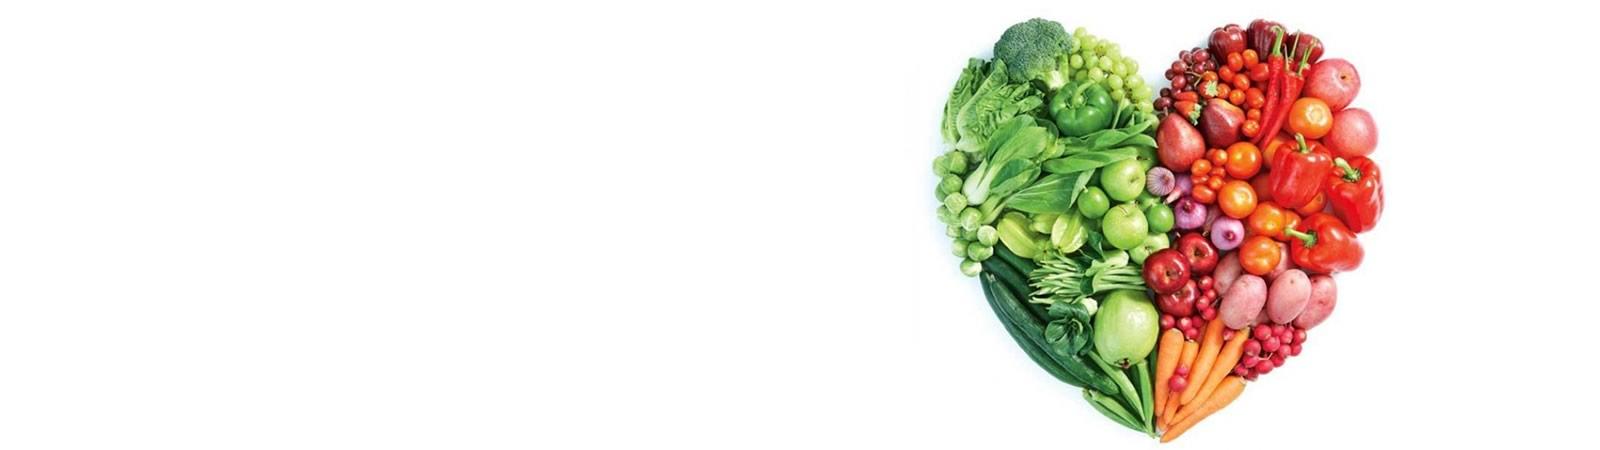 consulenza dieta Calzoni